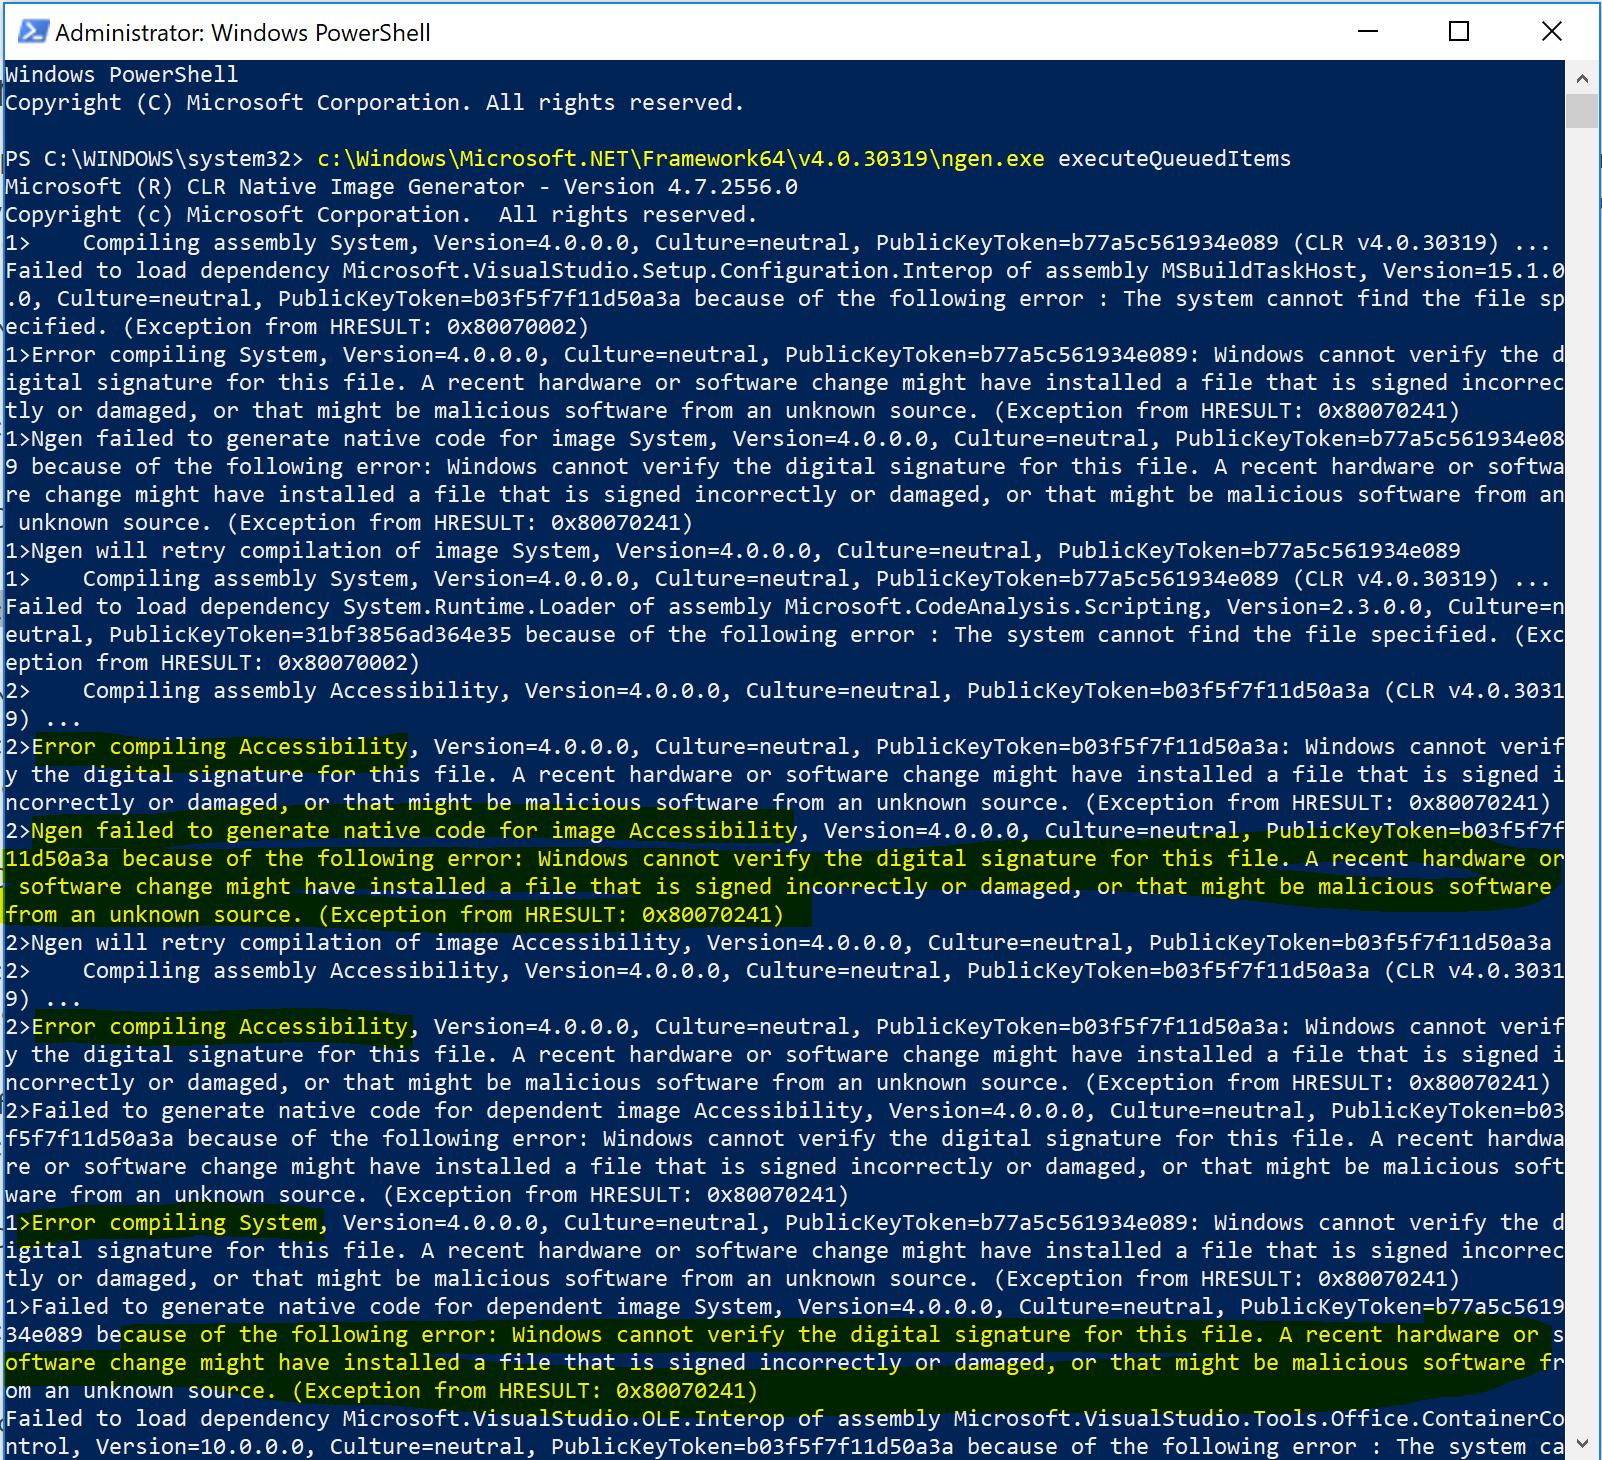 Mscorsvw exe and Ngen exe high CPU usage